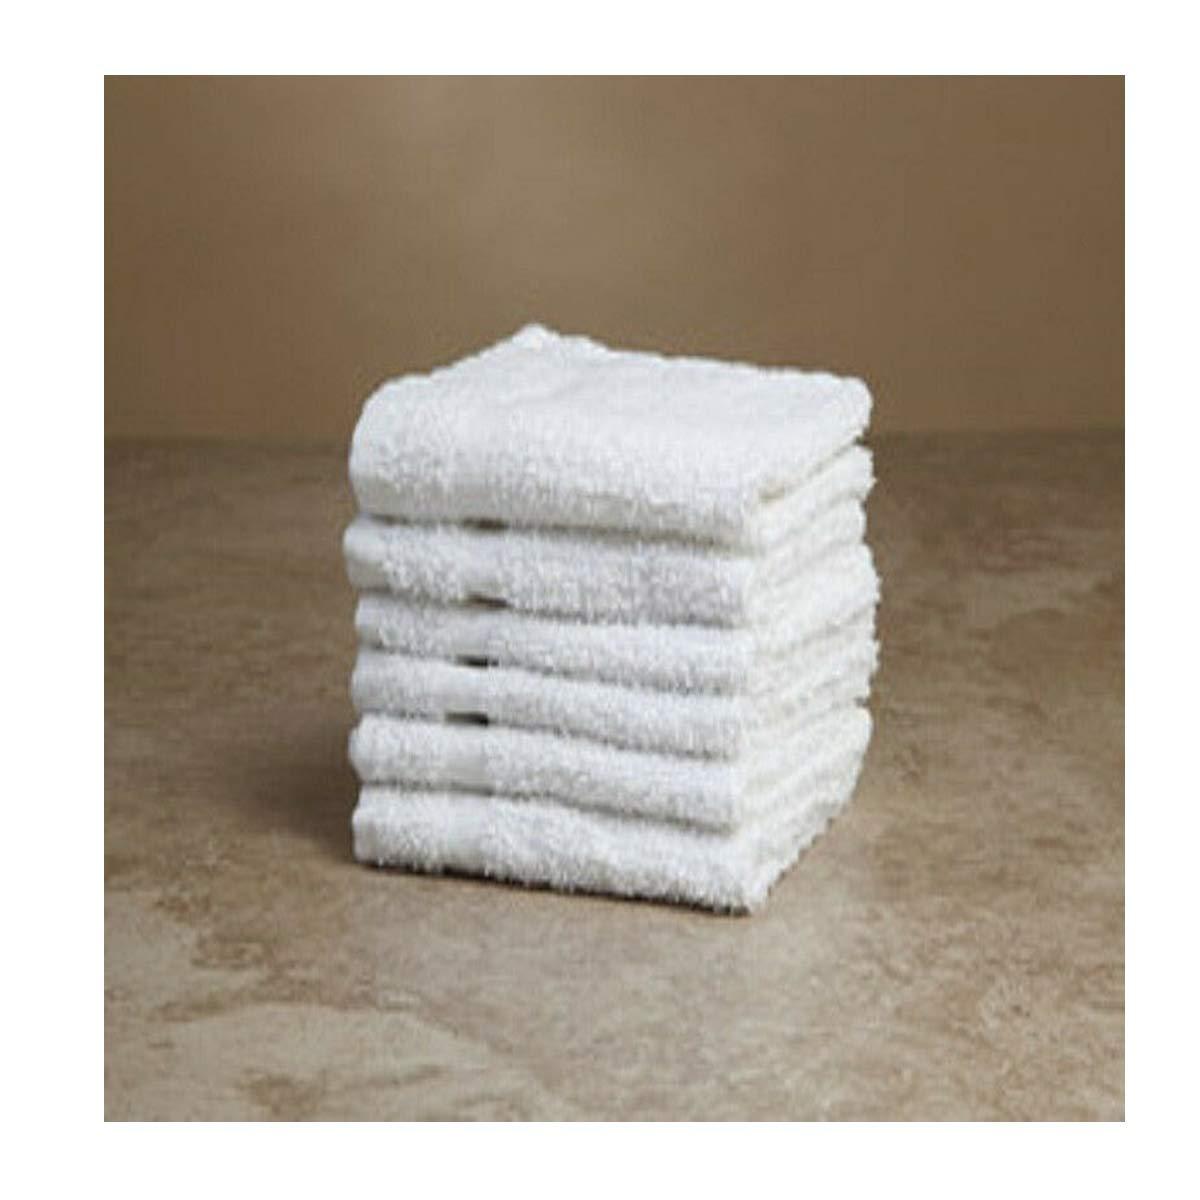 Unik always 240 (20 Dozen) 100% Cotton washcloths Single cam Border Wholesale Price 12x12